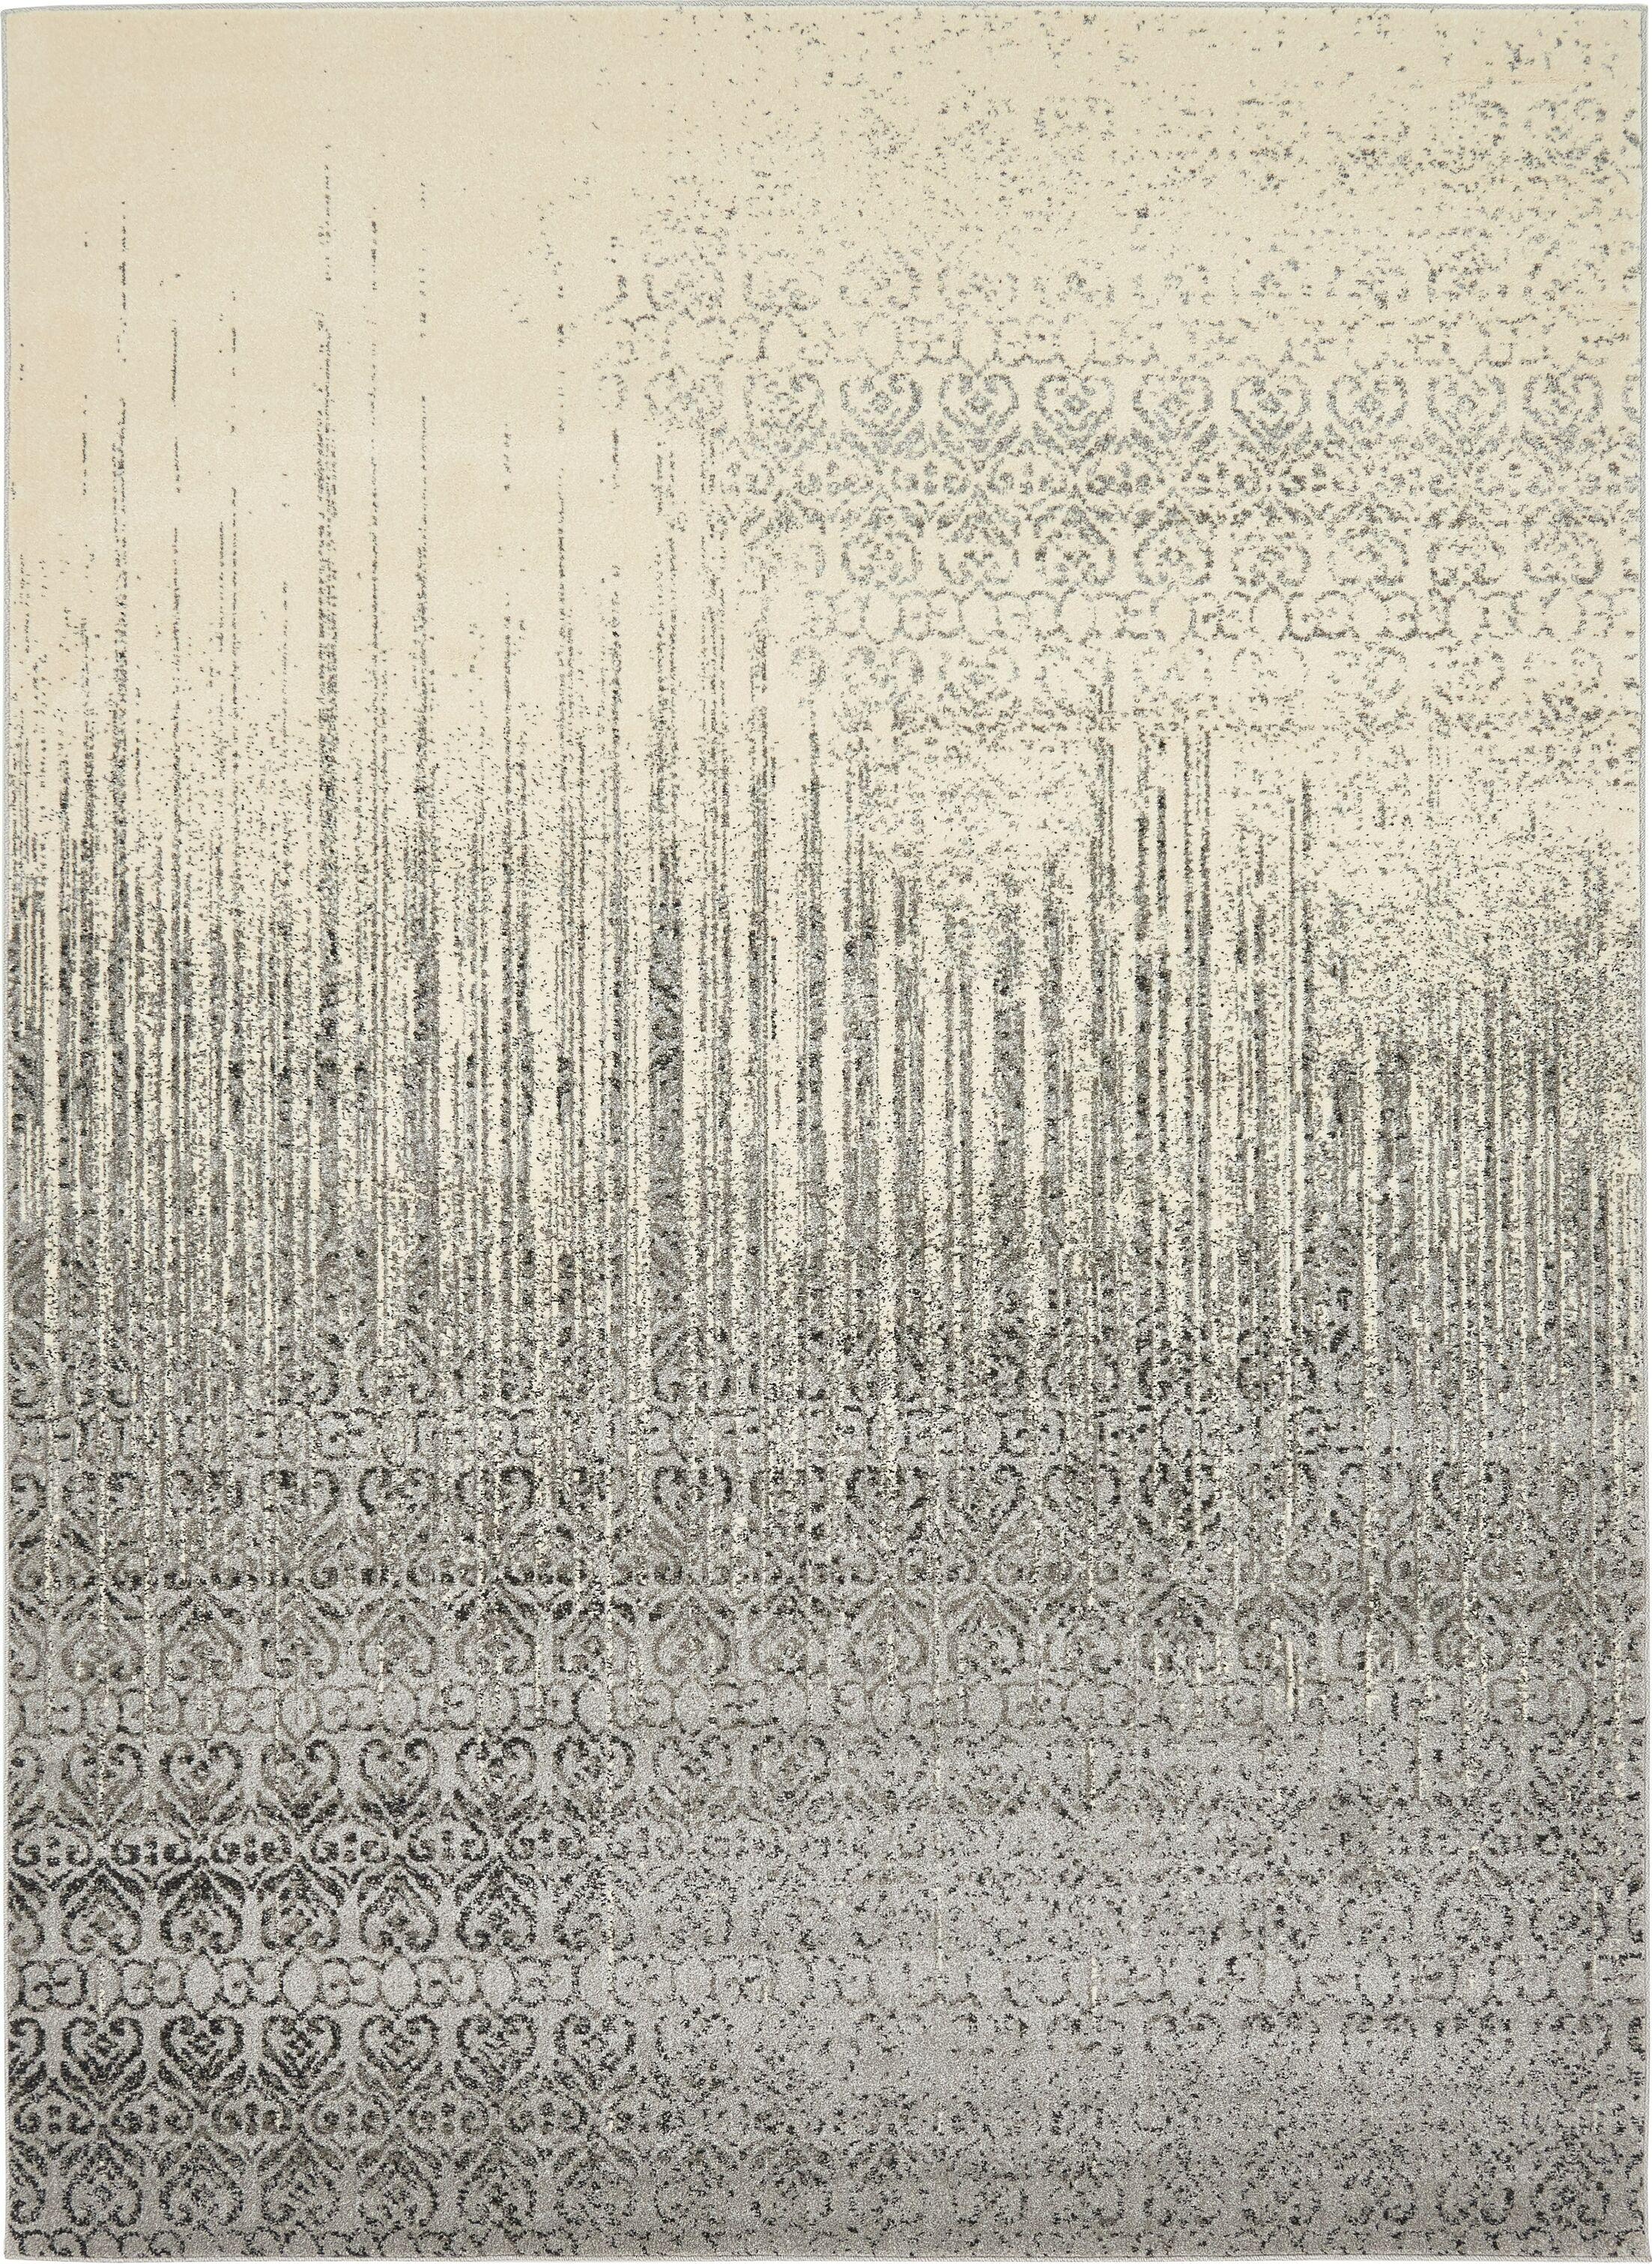 Dungan Gray Area Rug Rug Size: Rectangle 8' x 11'